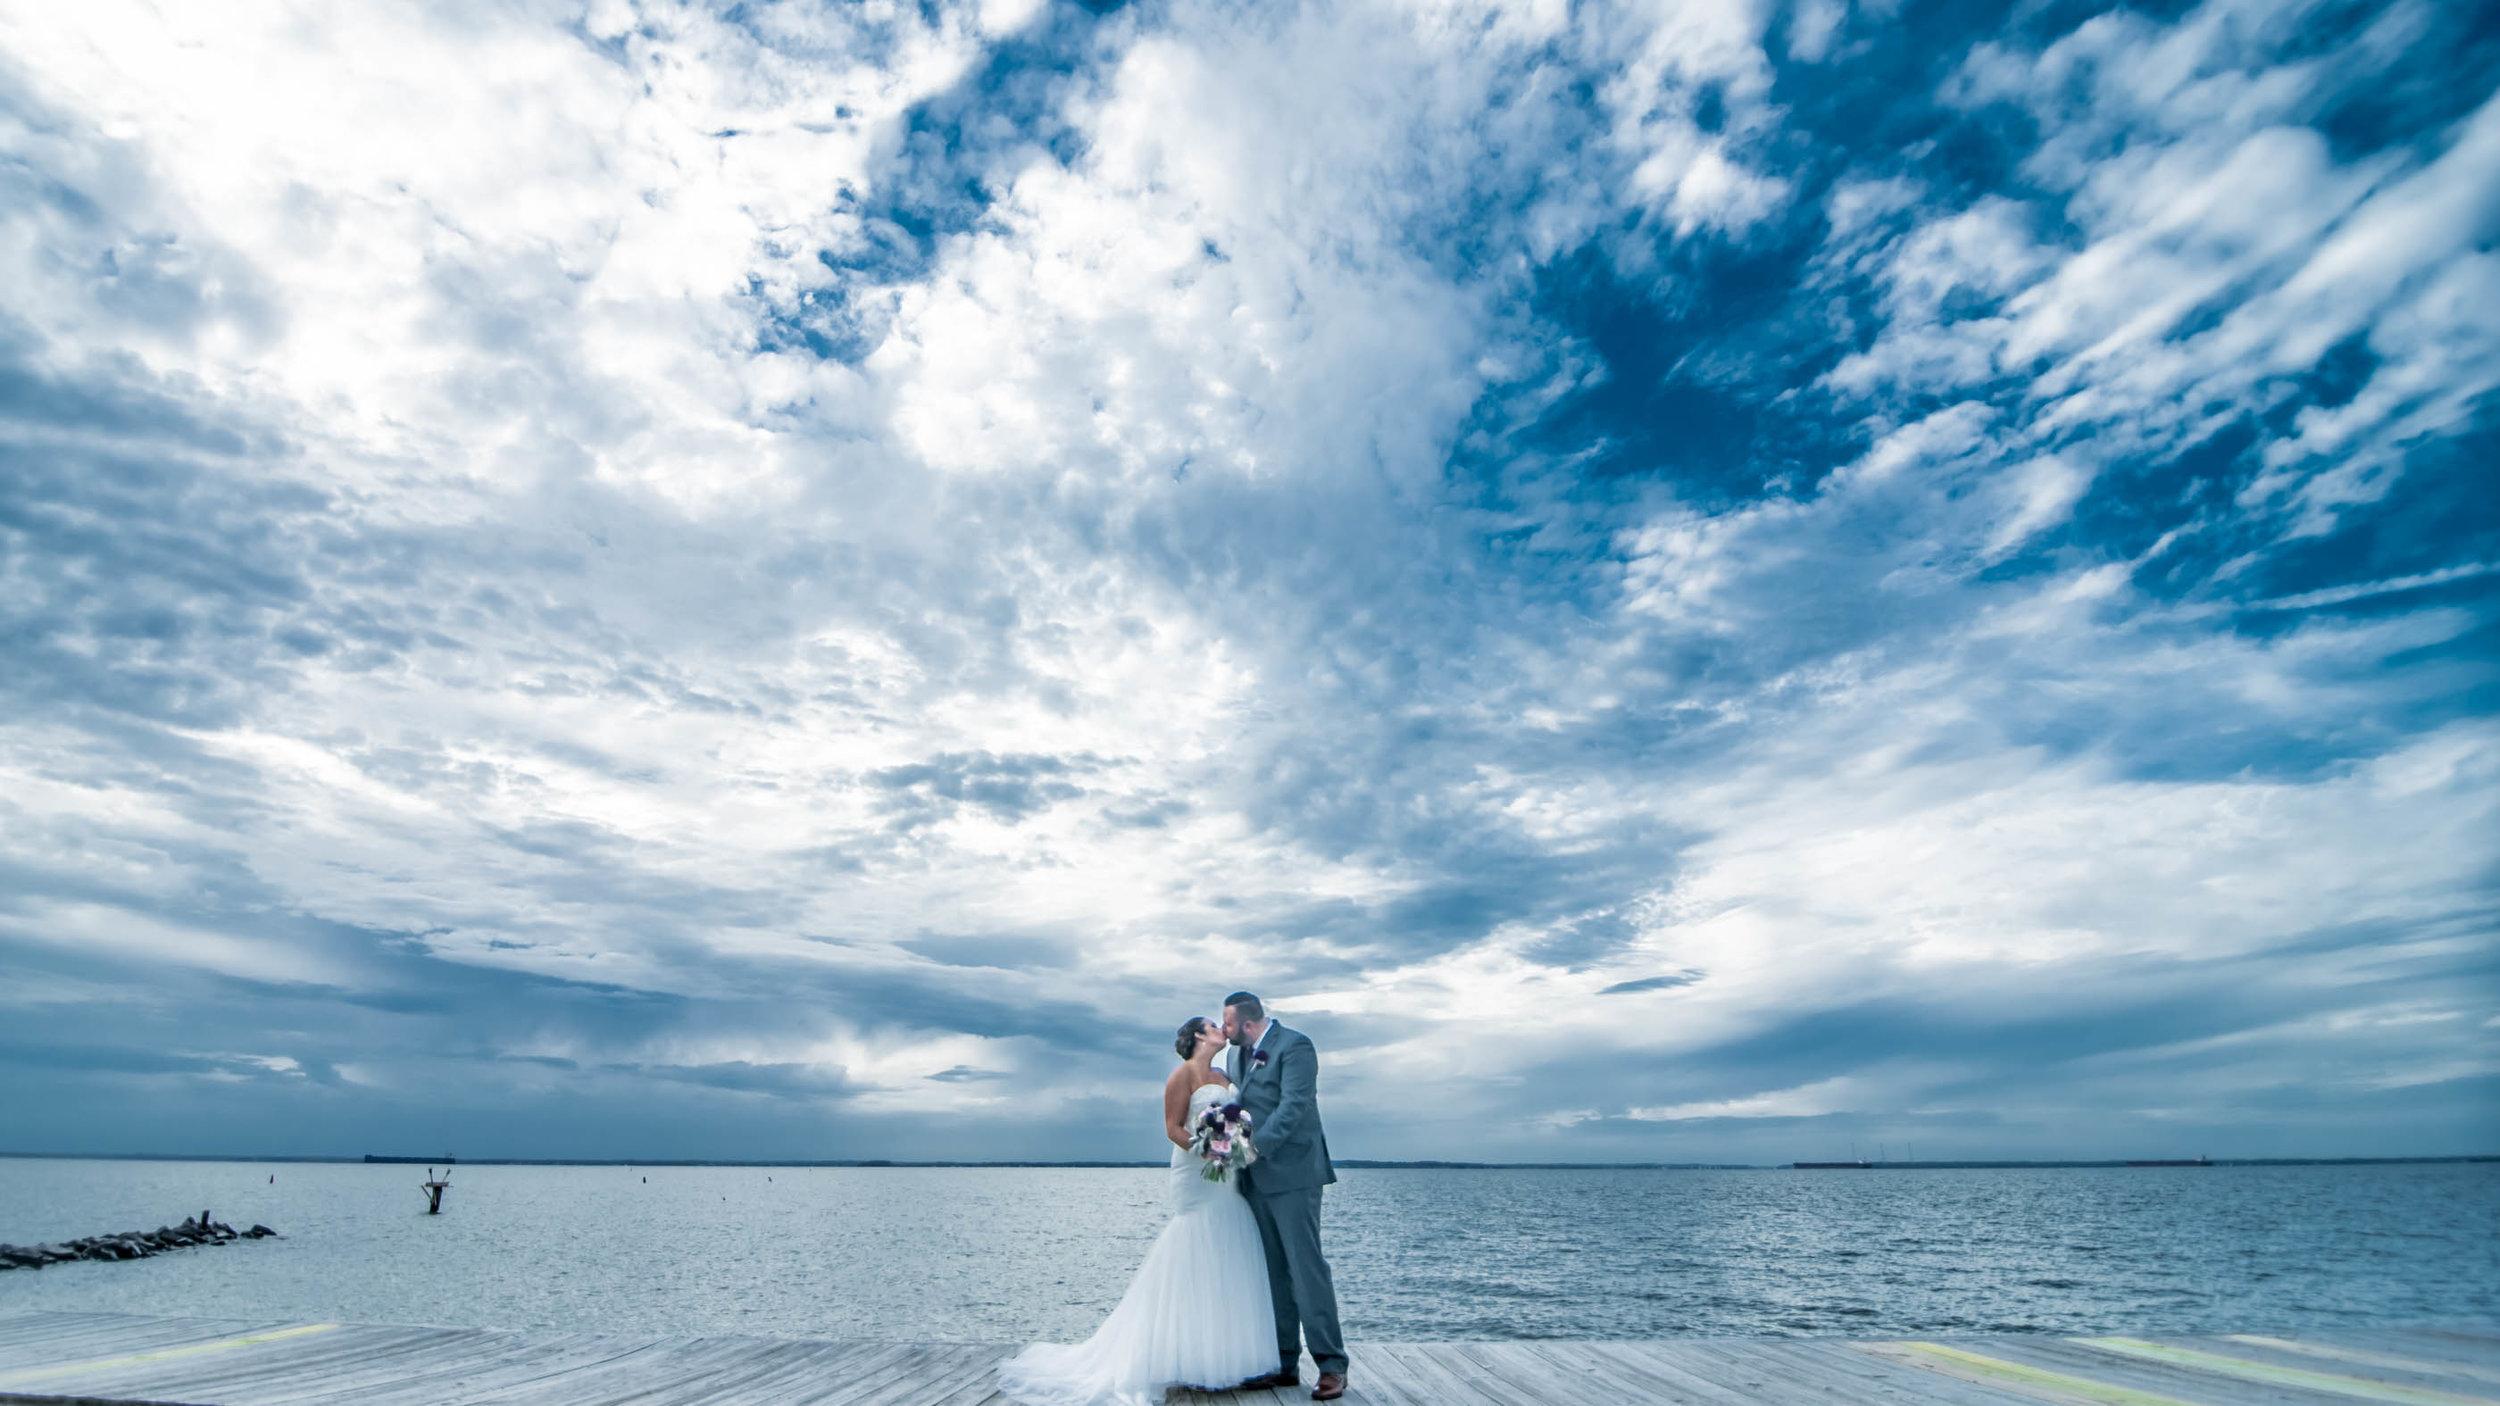 dc+metro+wedding+photography+vadym+guliuk-1789-14-56.jpg